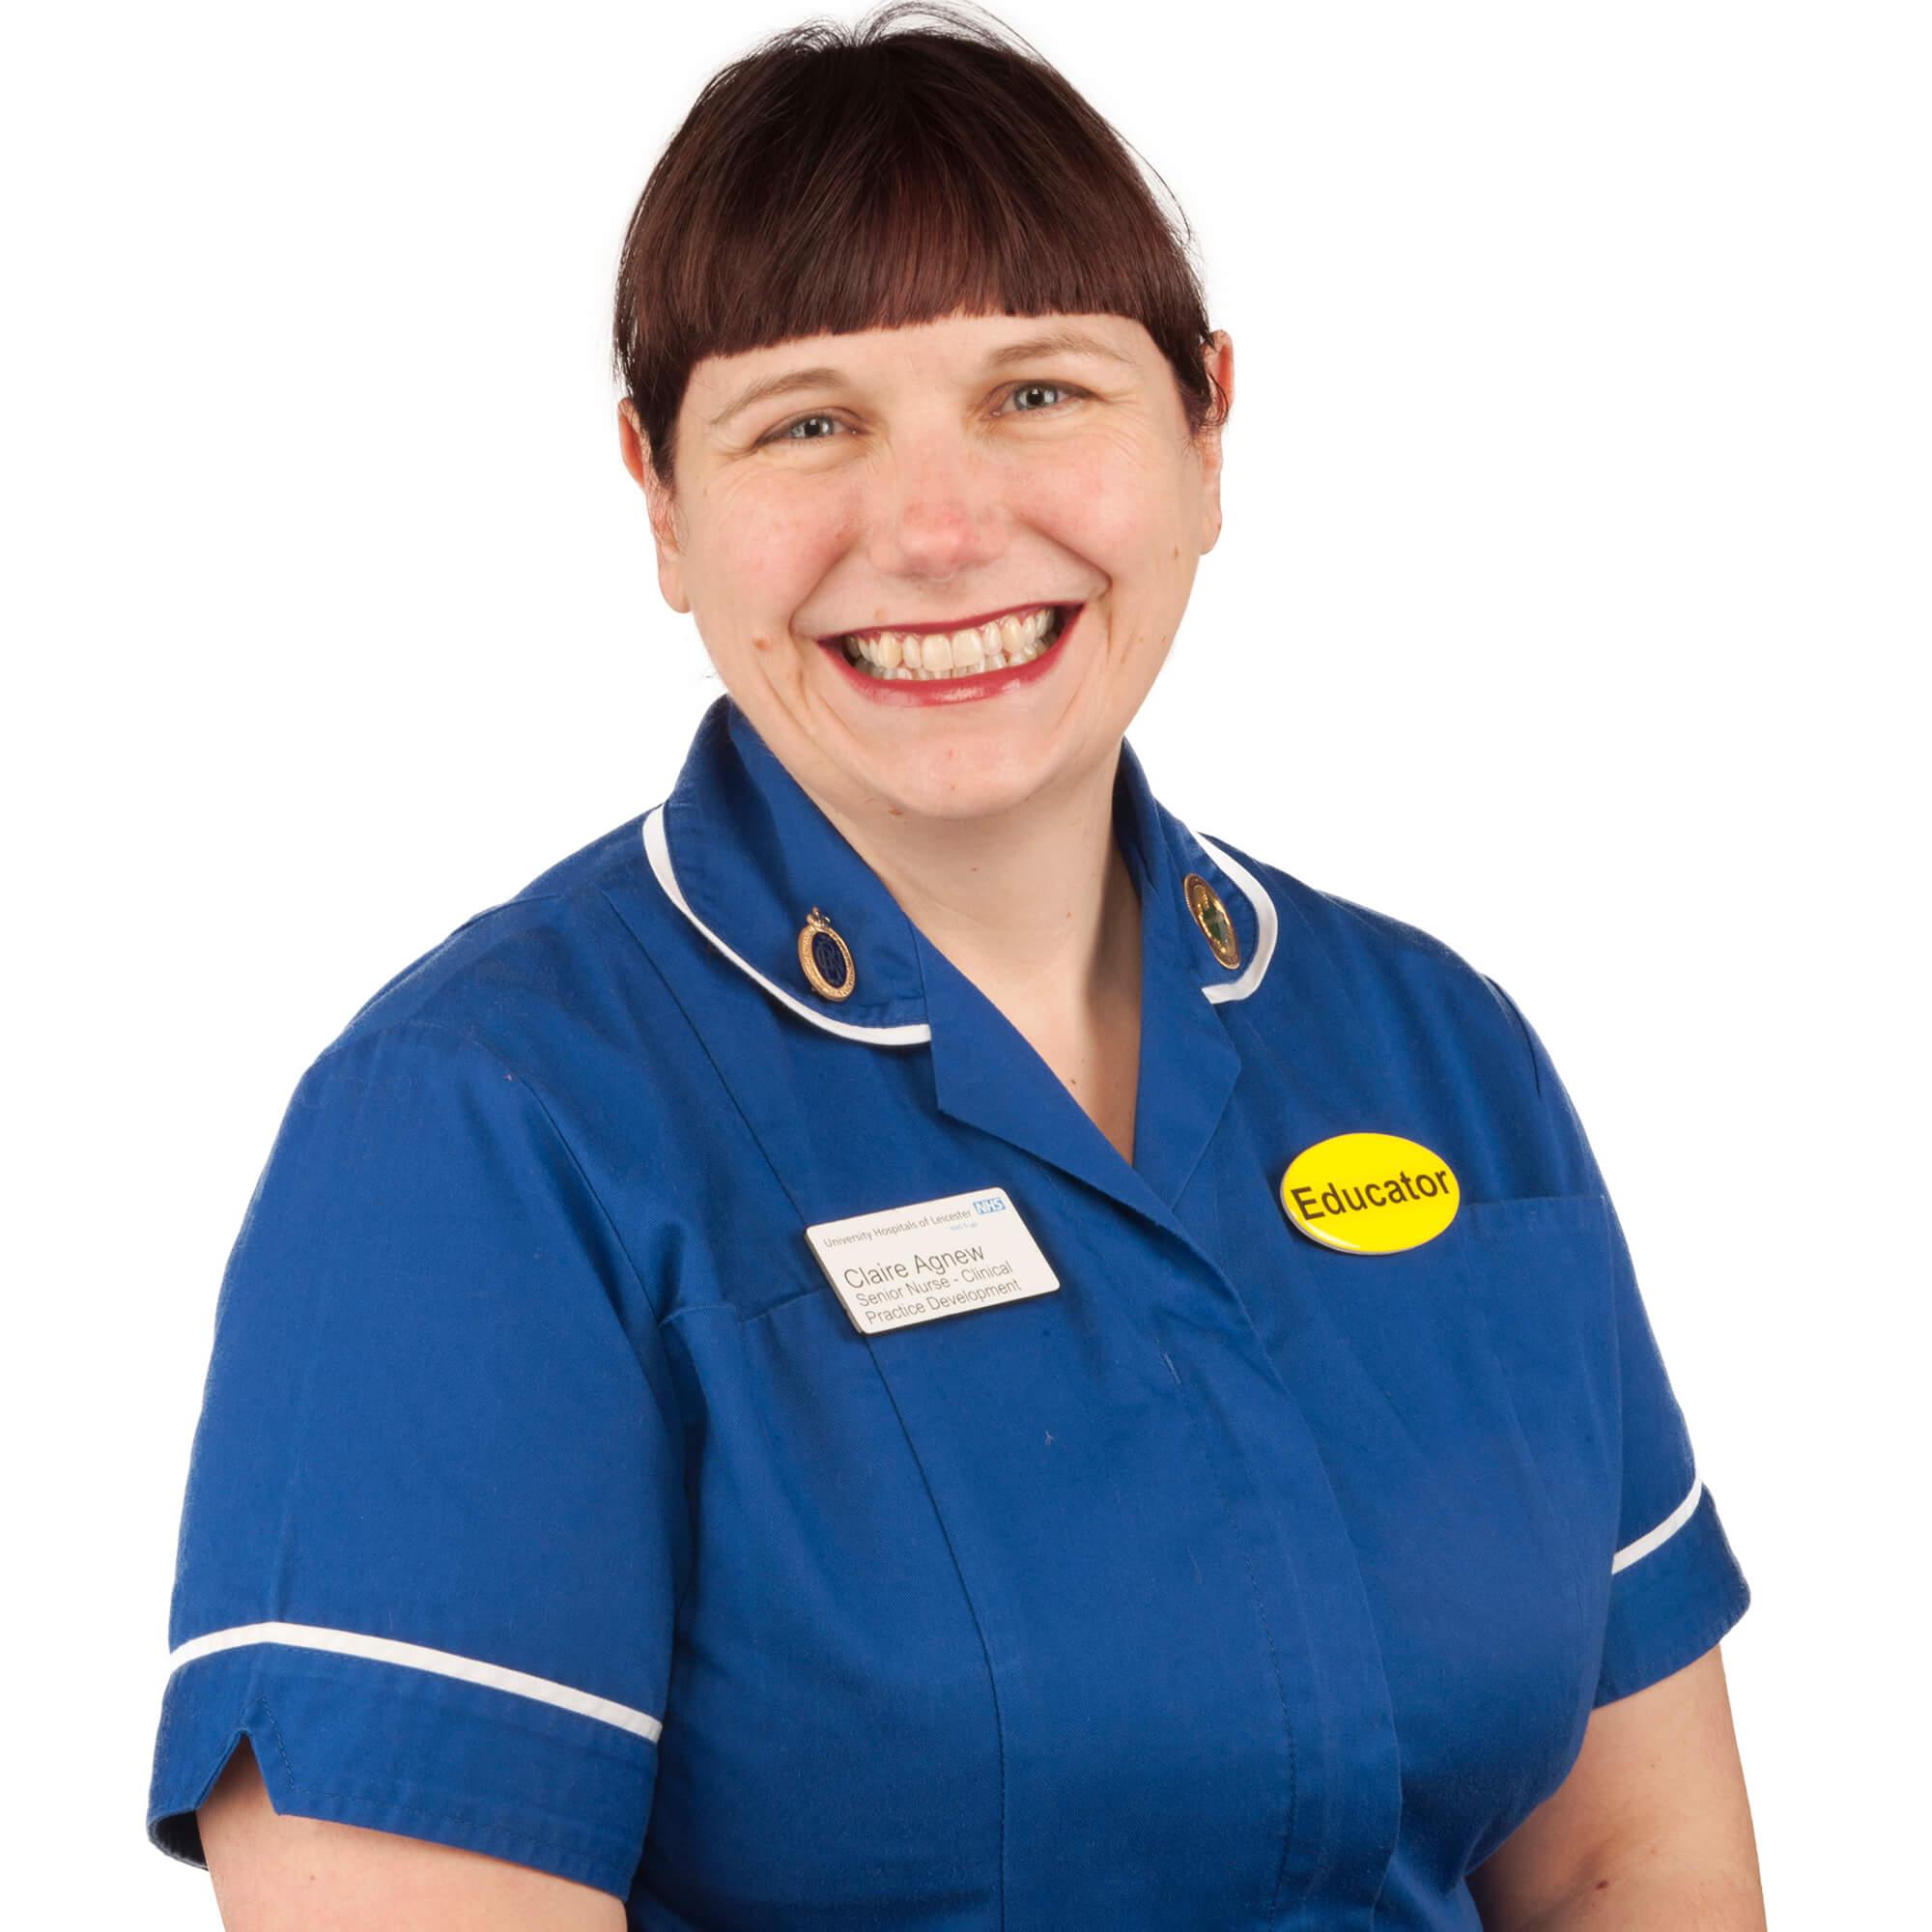 Claire wearing a nurse's uniform sitting, smiling.